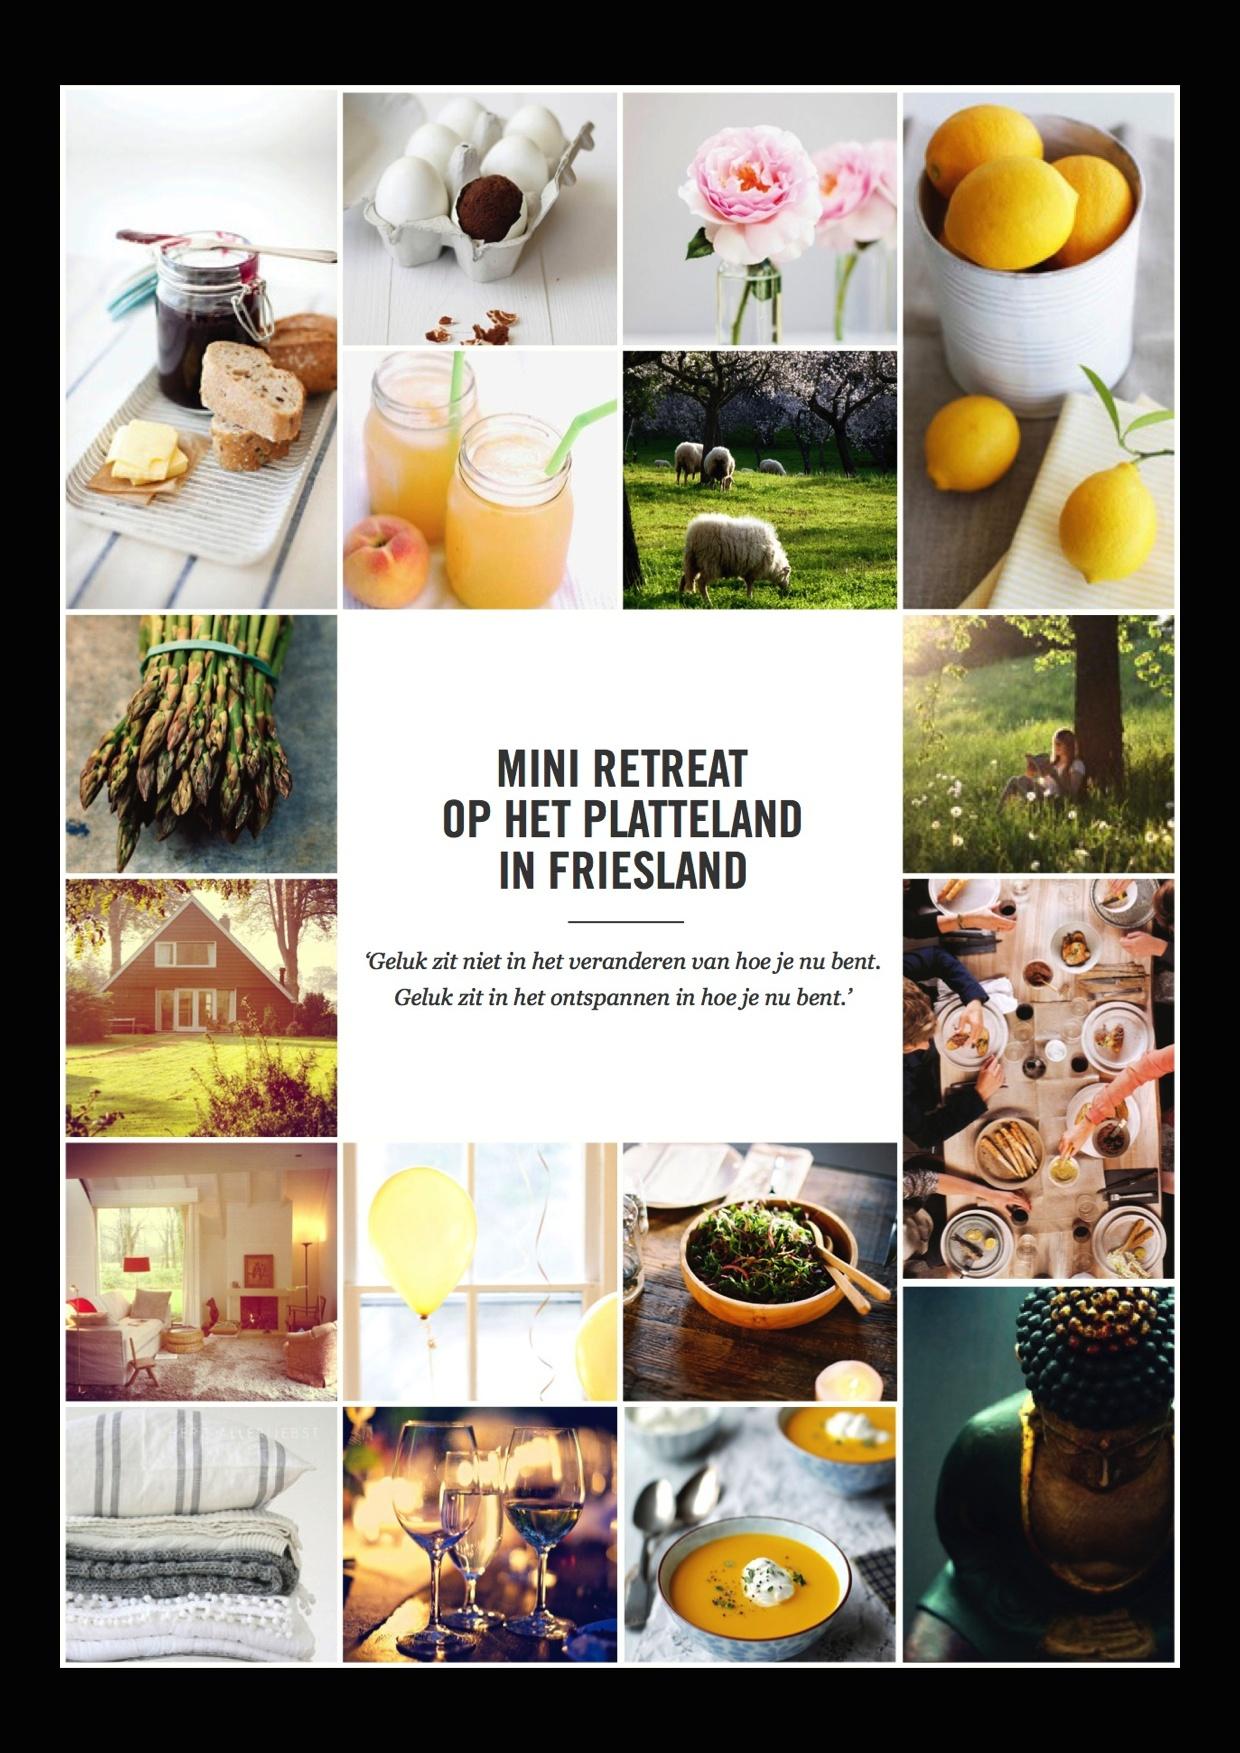 Mini Weekend Retreat In Friesland